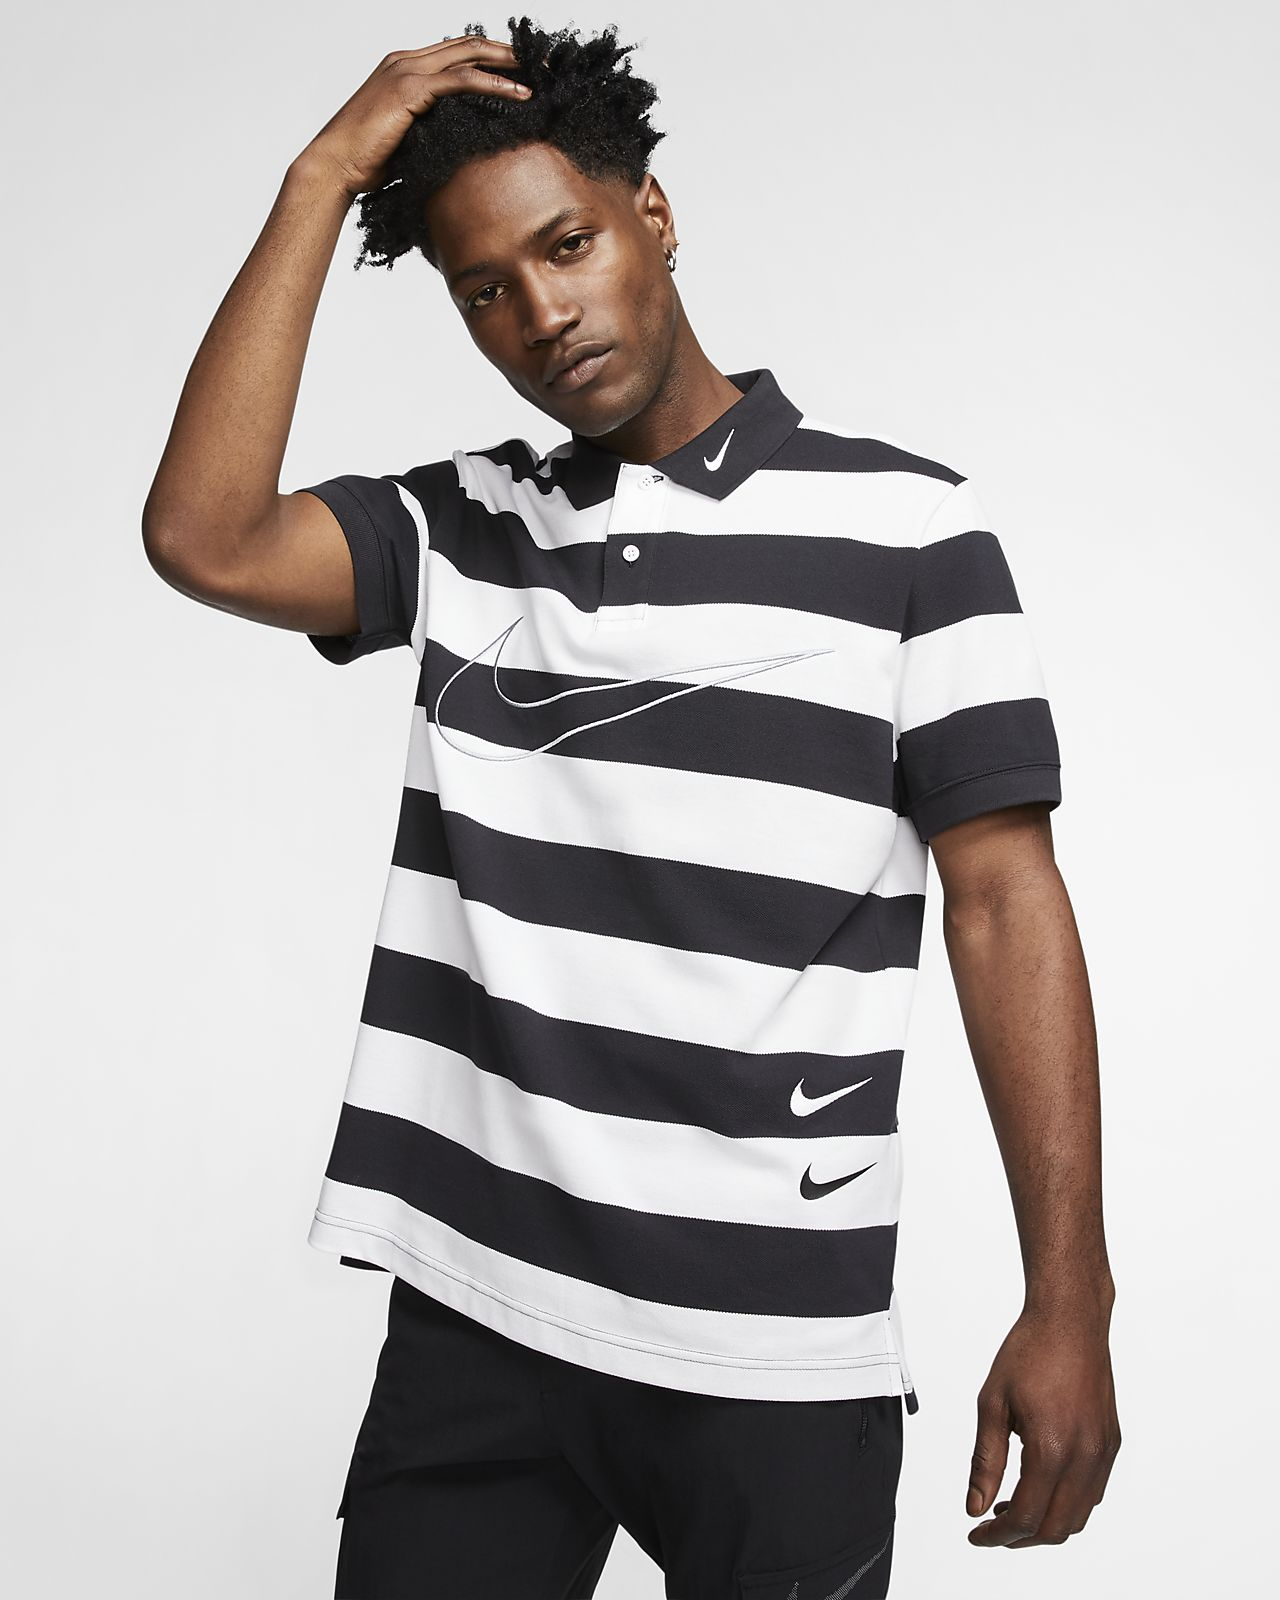 Nike Sportswear Swoosh Herren-Poloshirt aus Strickmaterial